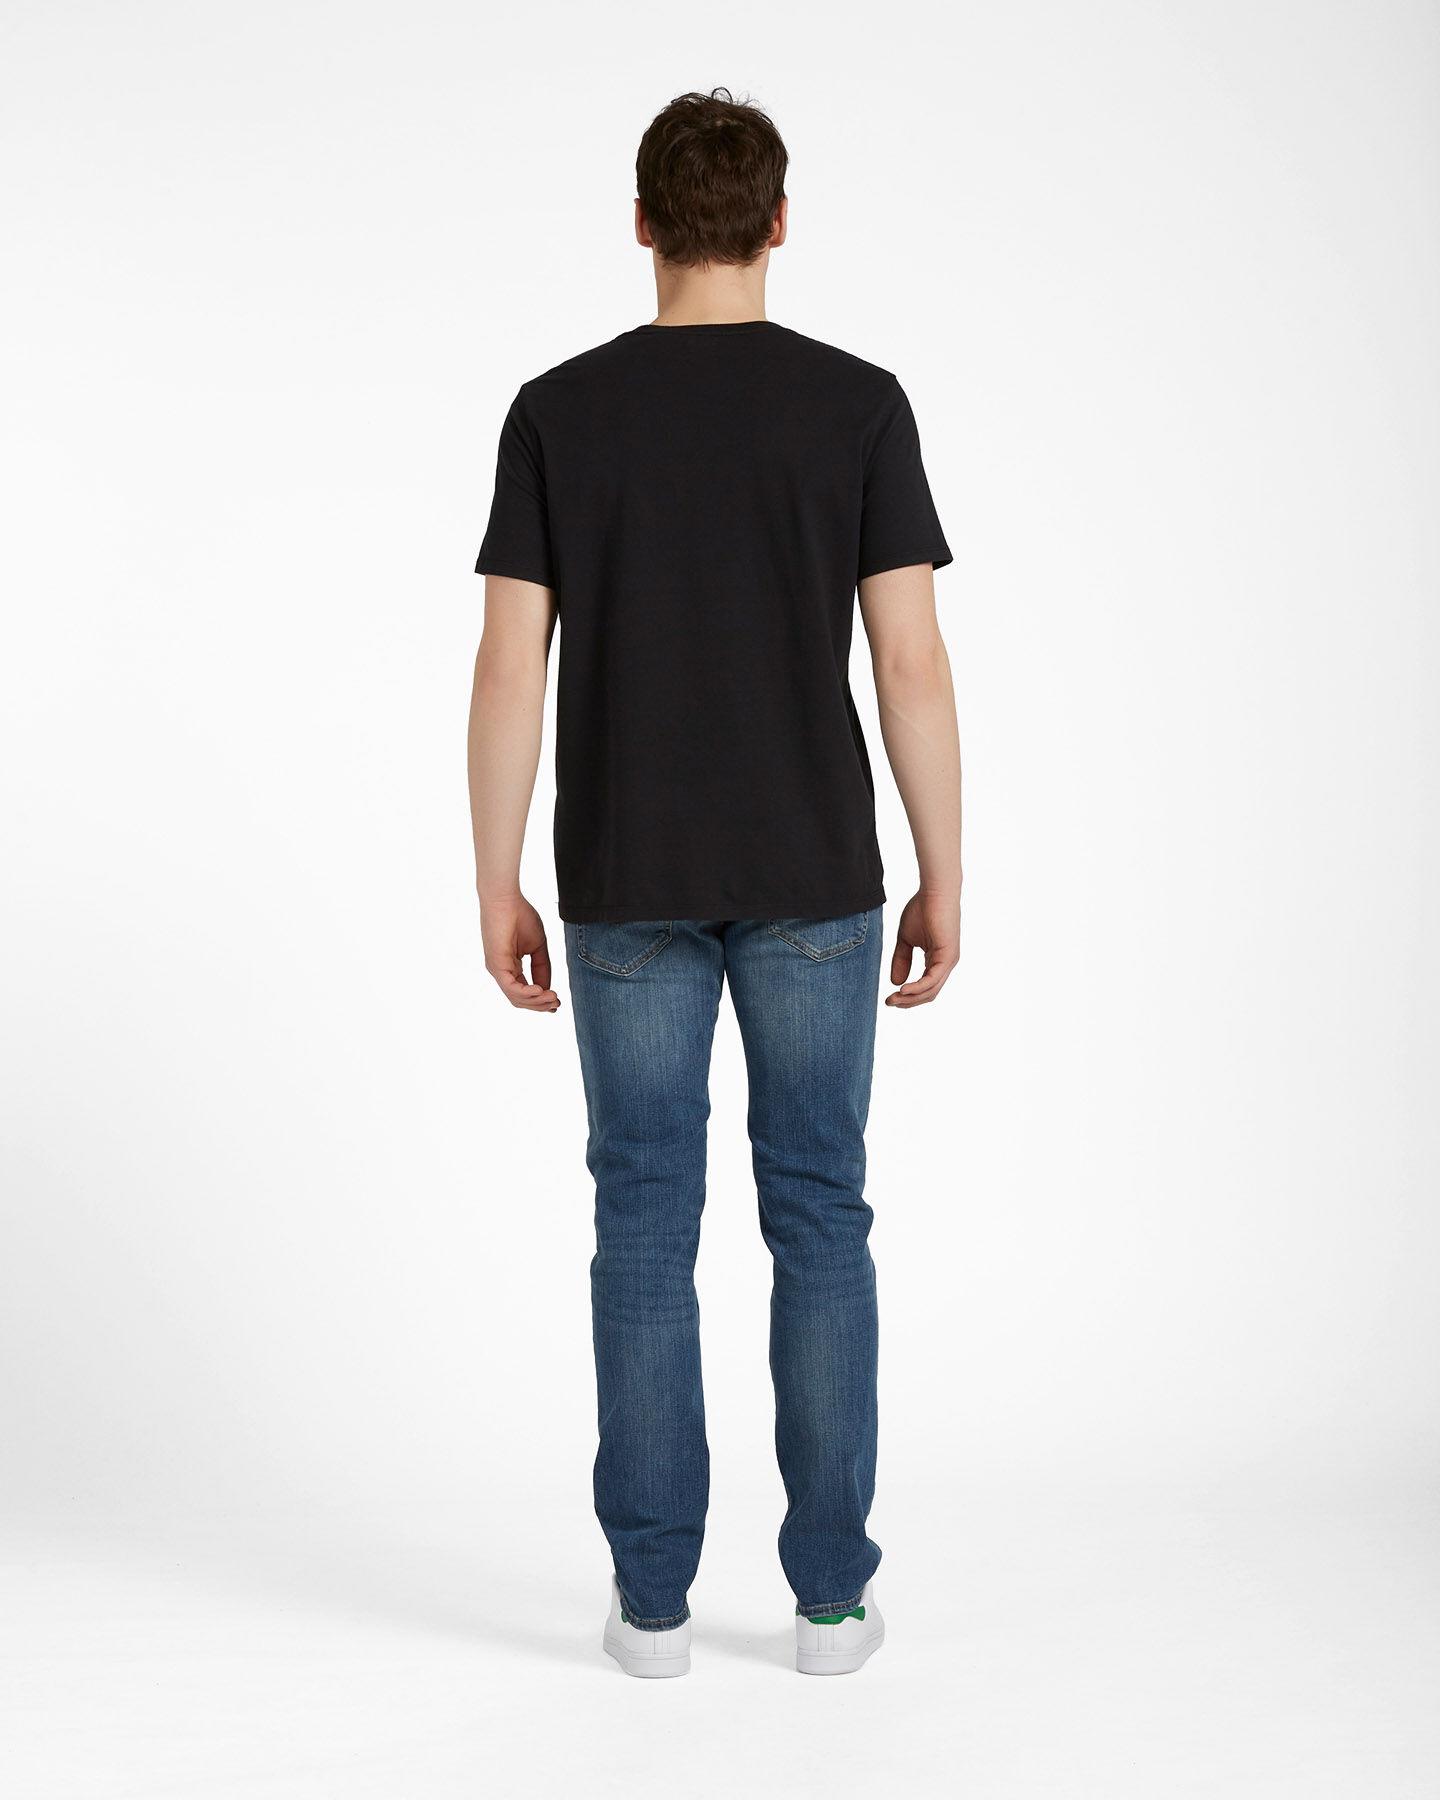 T-Shirt LEVI'S ORIGINAL M S4076919 scatto 2